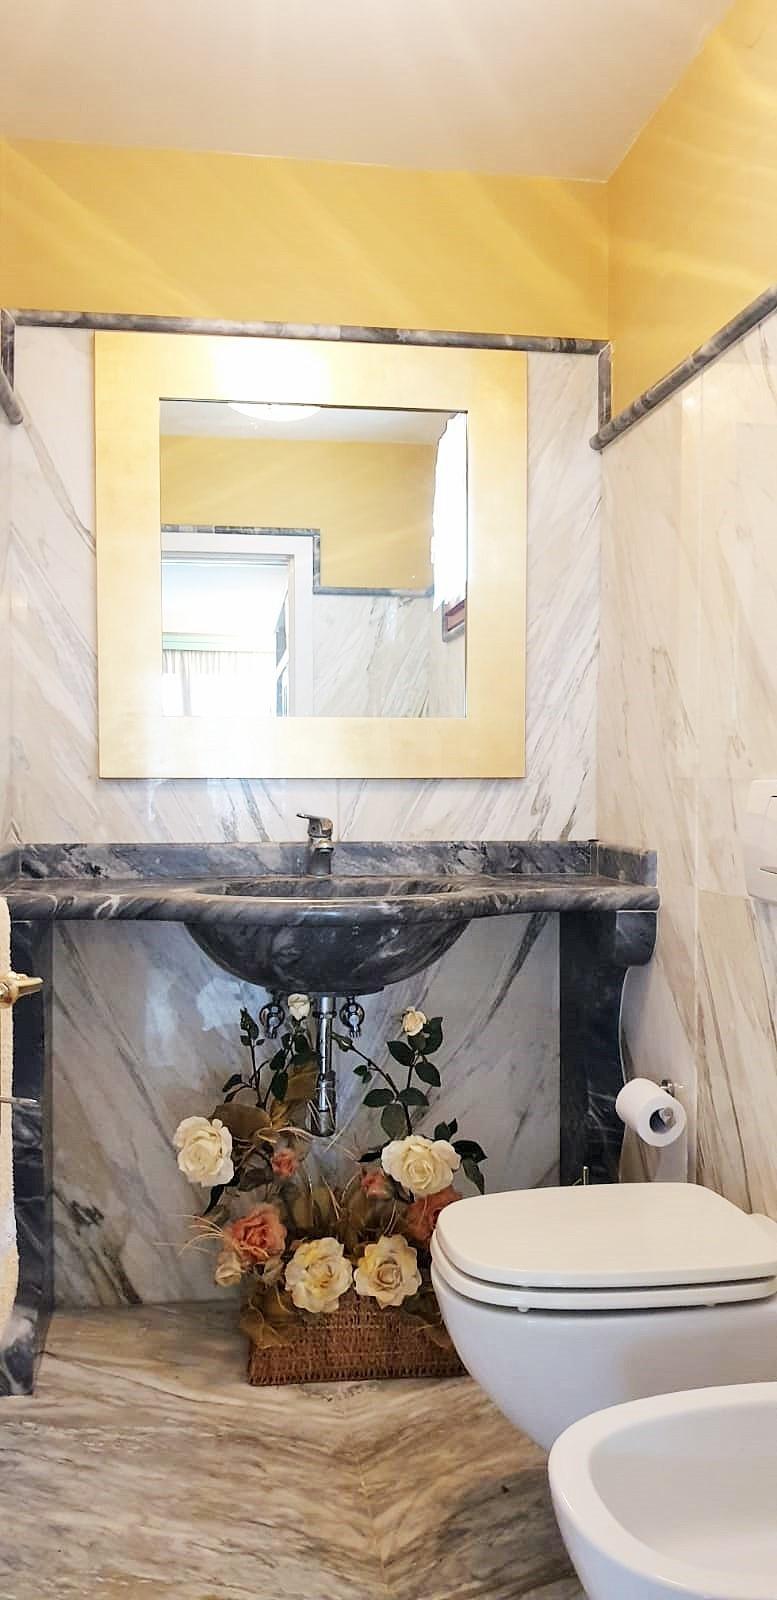 Casa singola in vendita - Perignano, Casciana Terme Lari